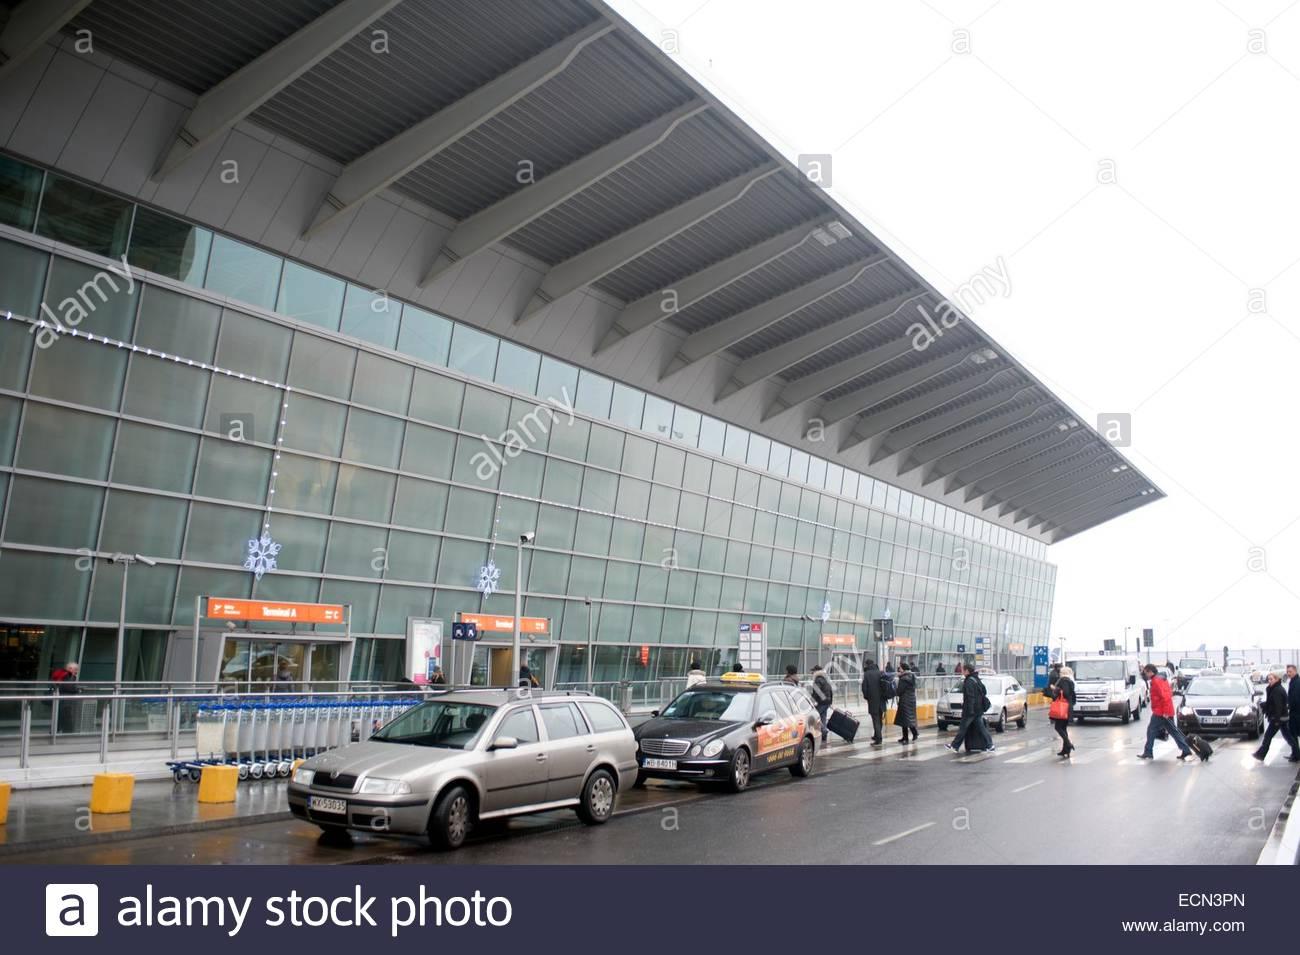 Aeroporto Waw : Warsaw poland warsaw chopin airport waw terminal exterior stock